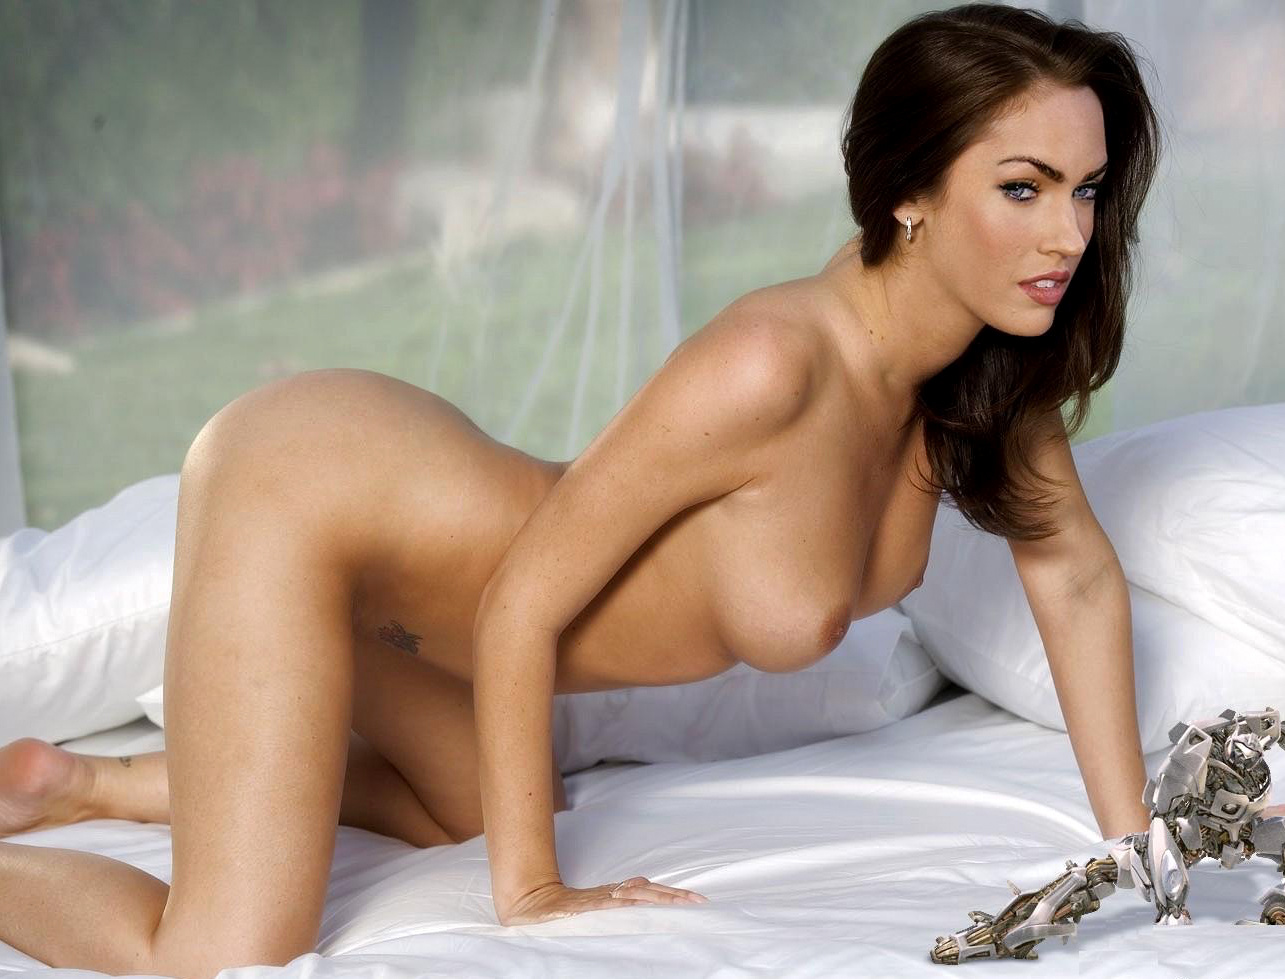 Men naked picture of megan fox women naked